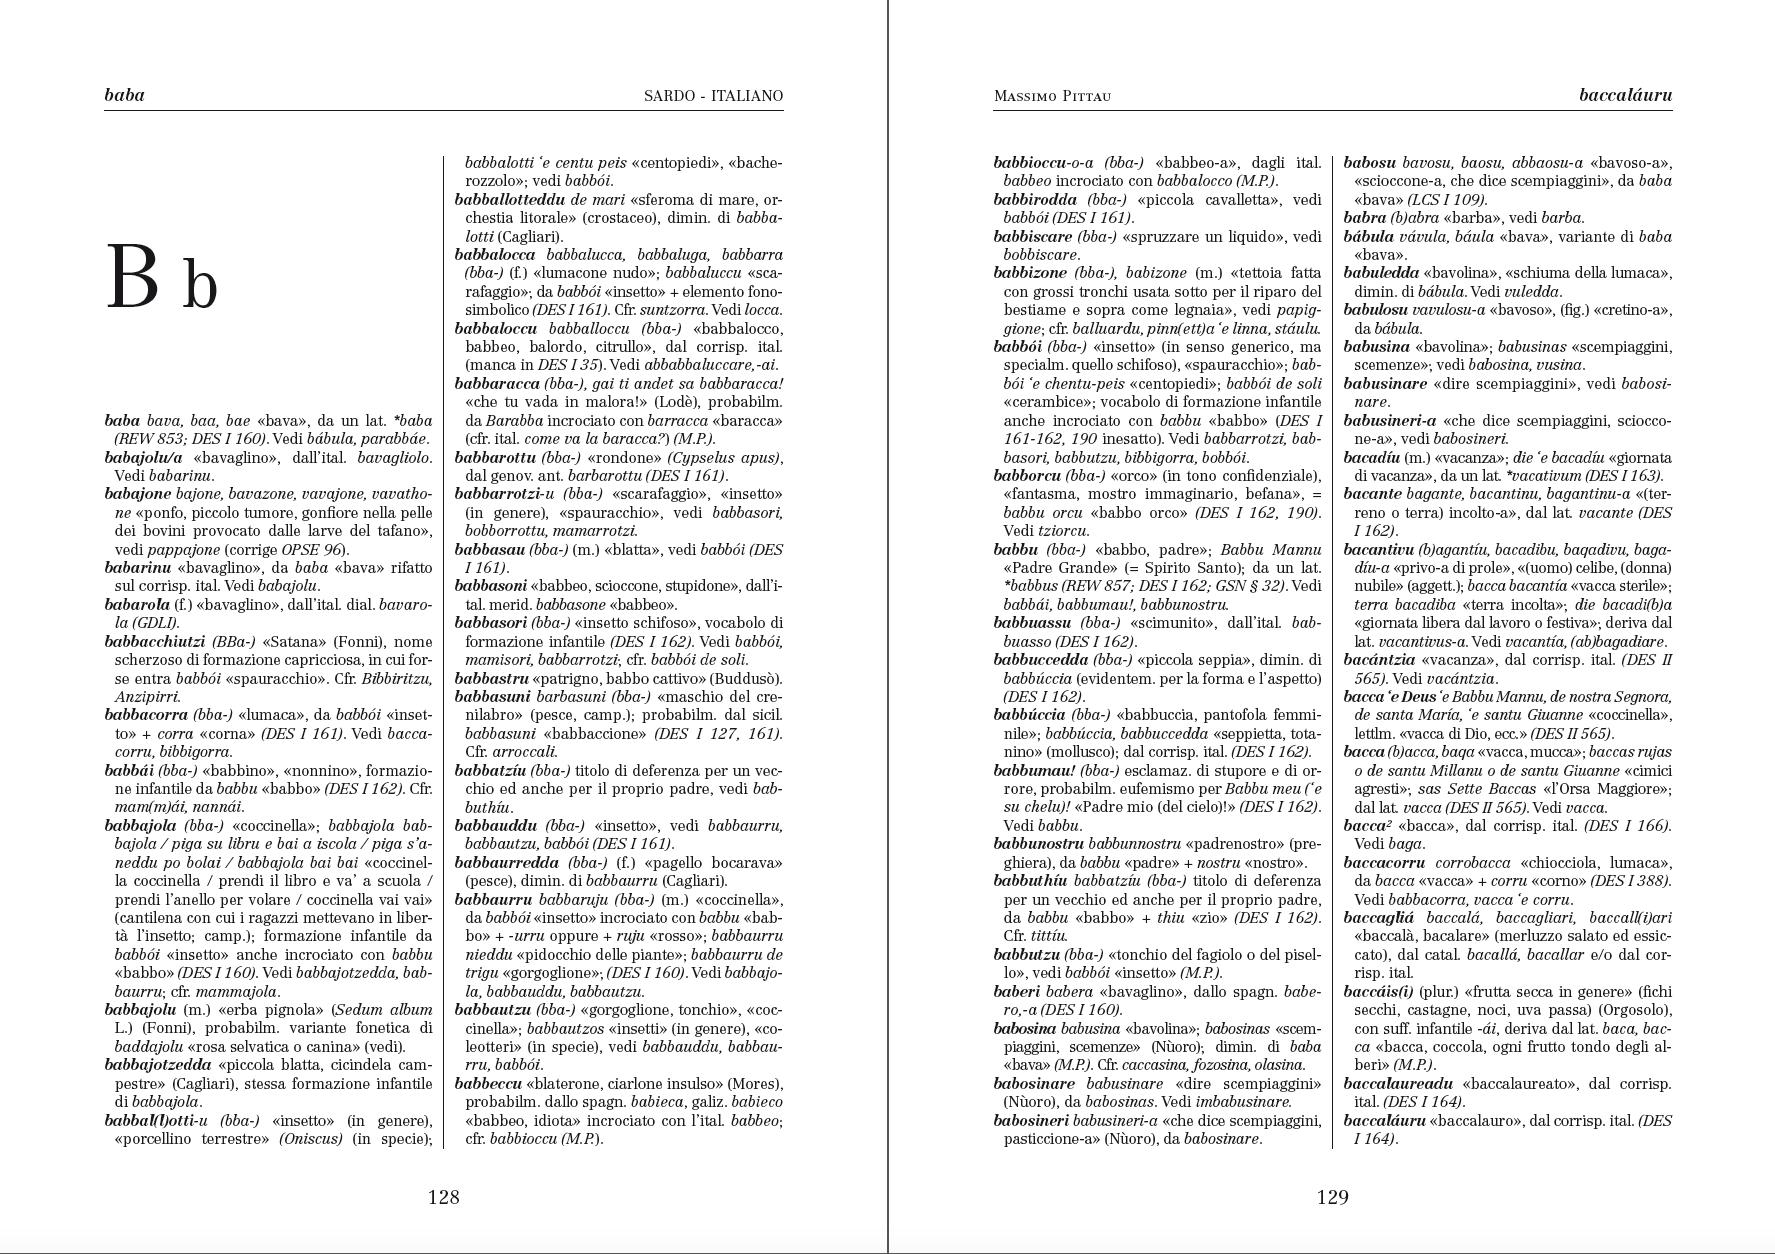 Vocabolario della Lingua Sarda_esempio